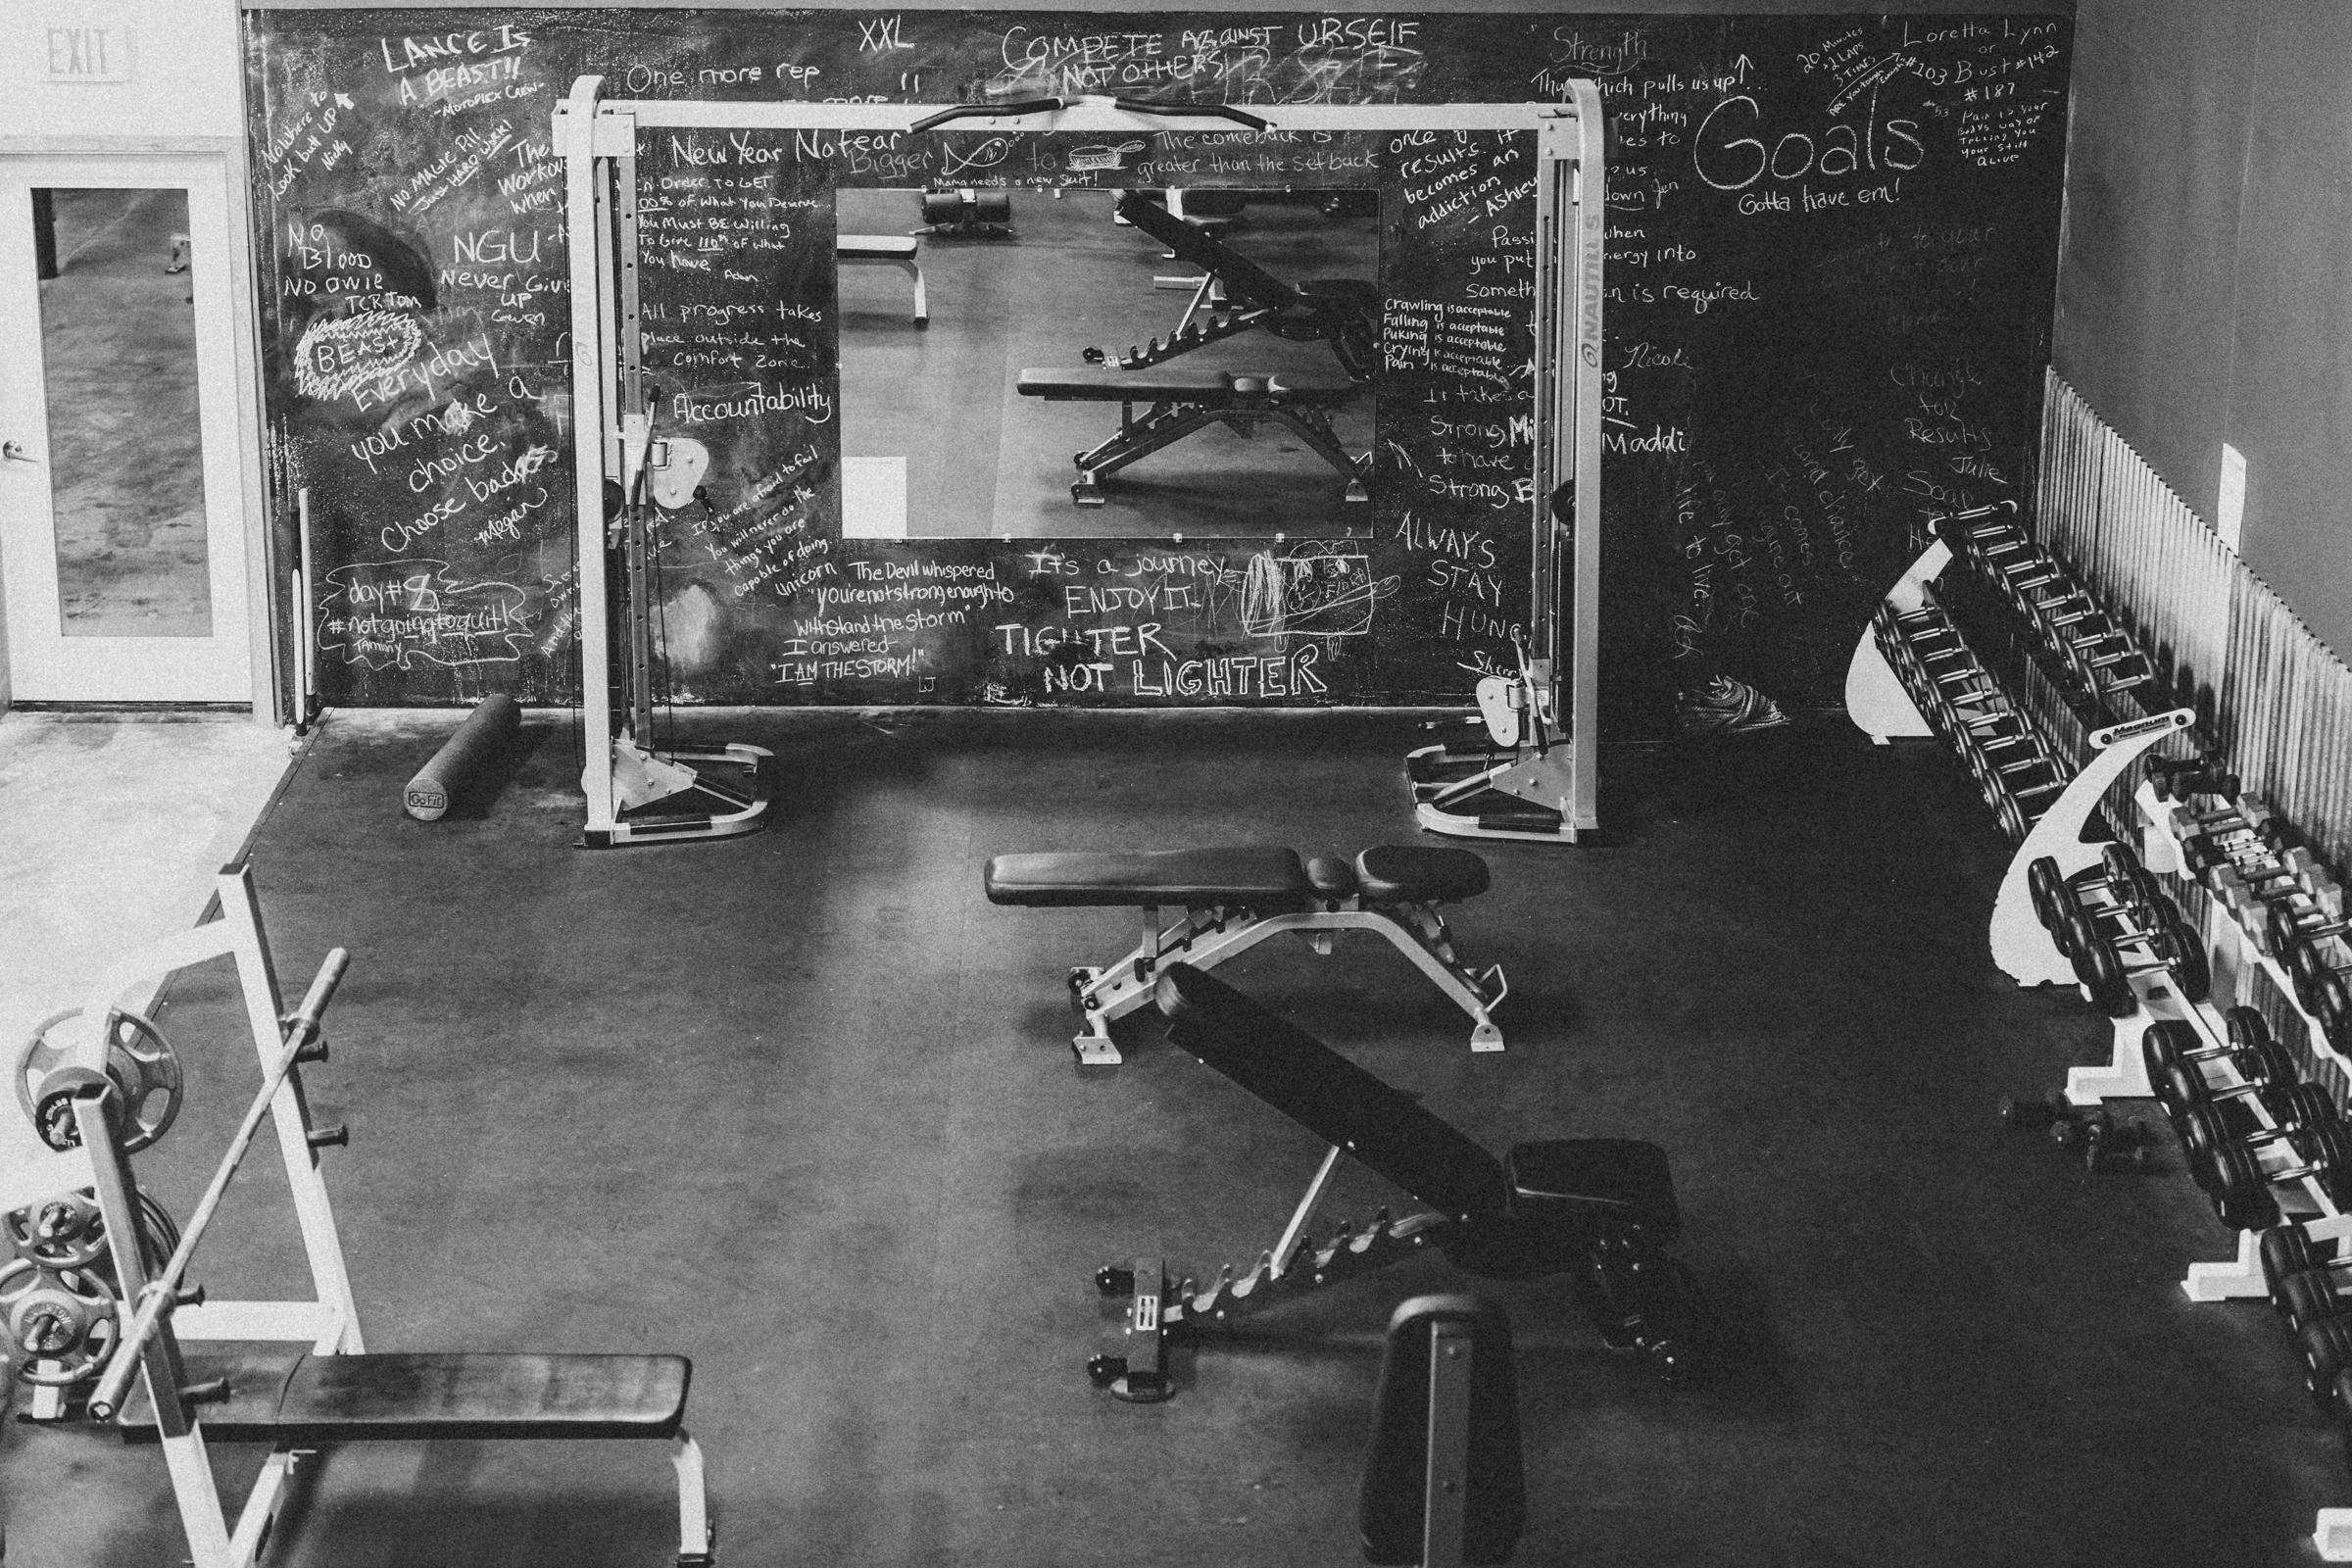 001-Stronger.Version.Fitness.Gym.Shots.18-57.jpg